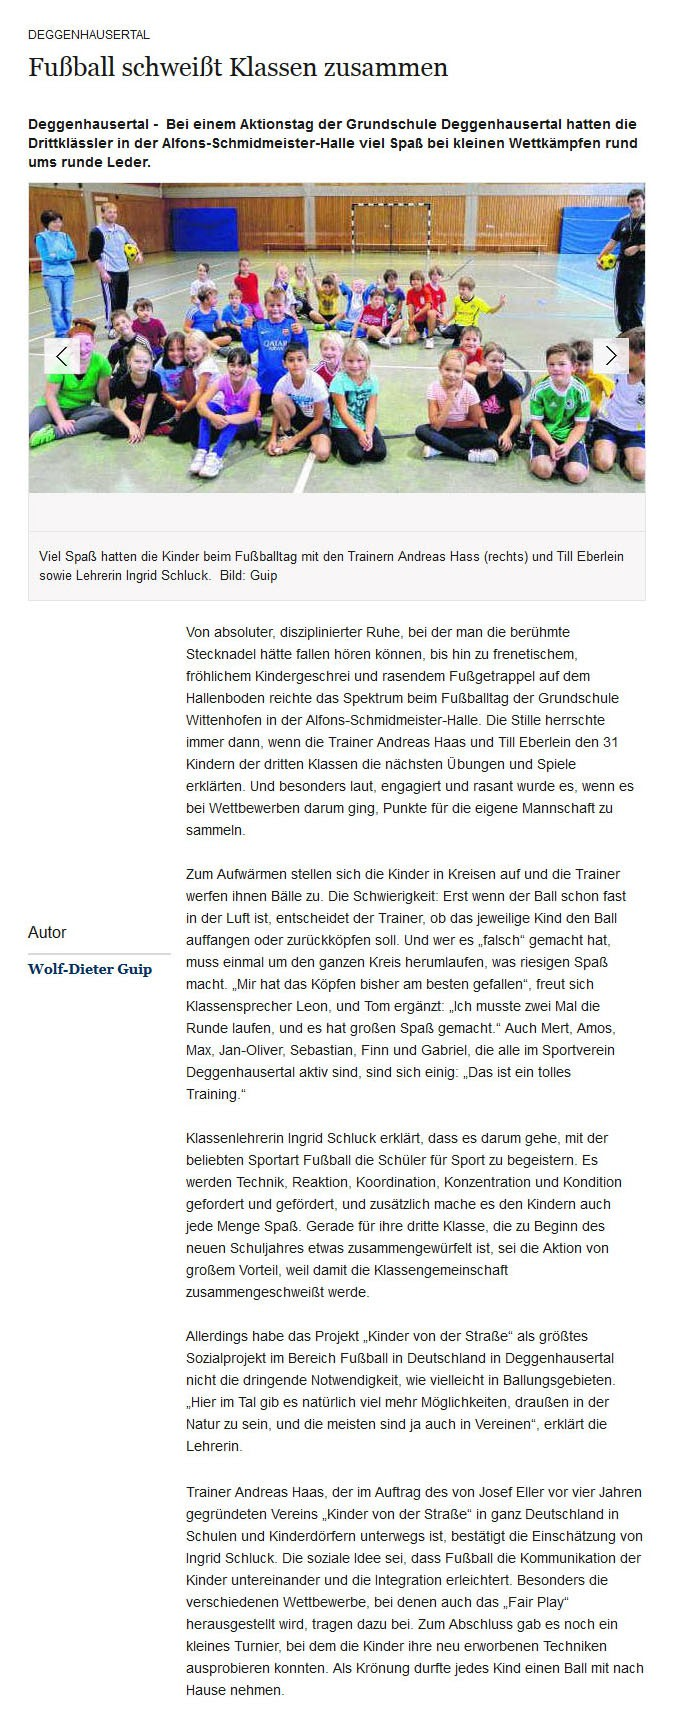 Suedkurier vom 09102013 - Bild 1 - Datum: 09.10.2013 - Tags: Pressebericht, AKTION FUSSBALLTAG e.V.